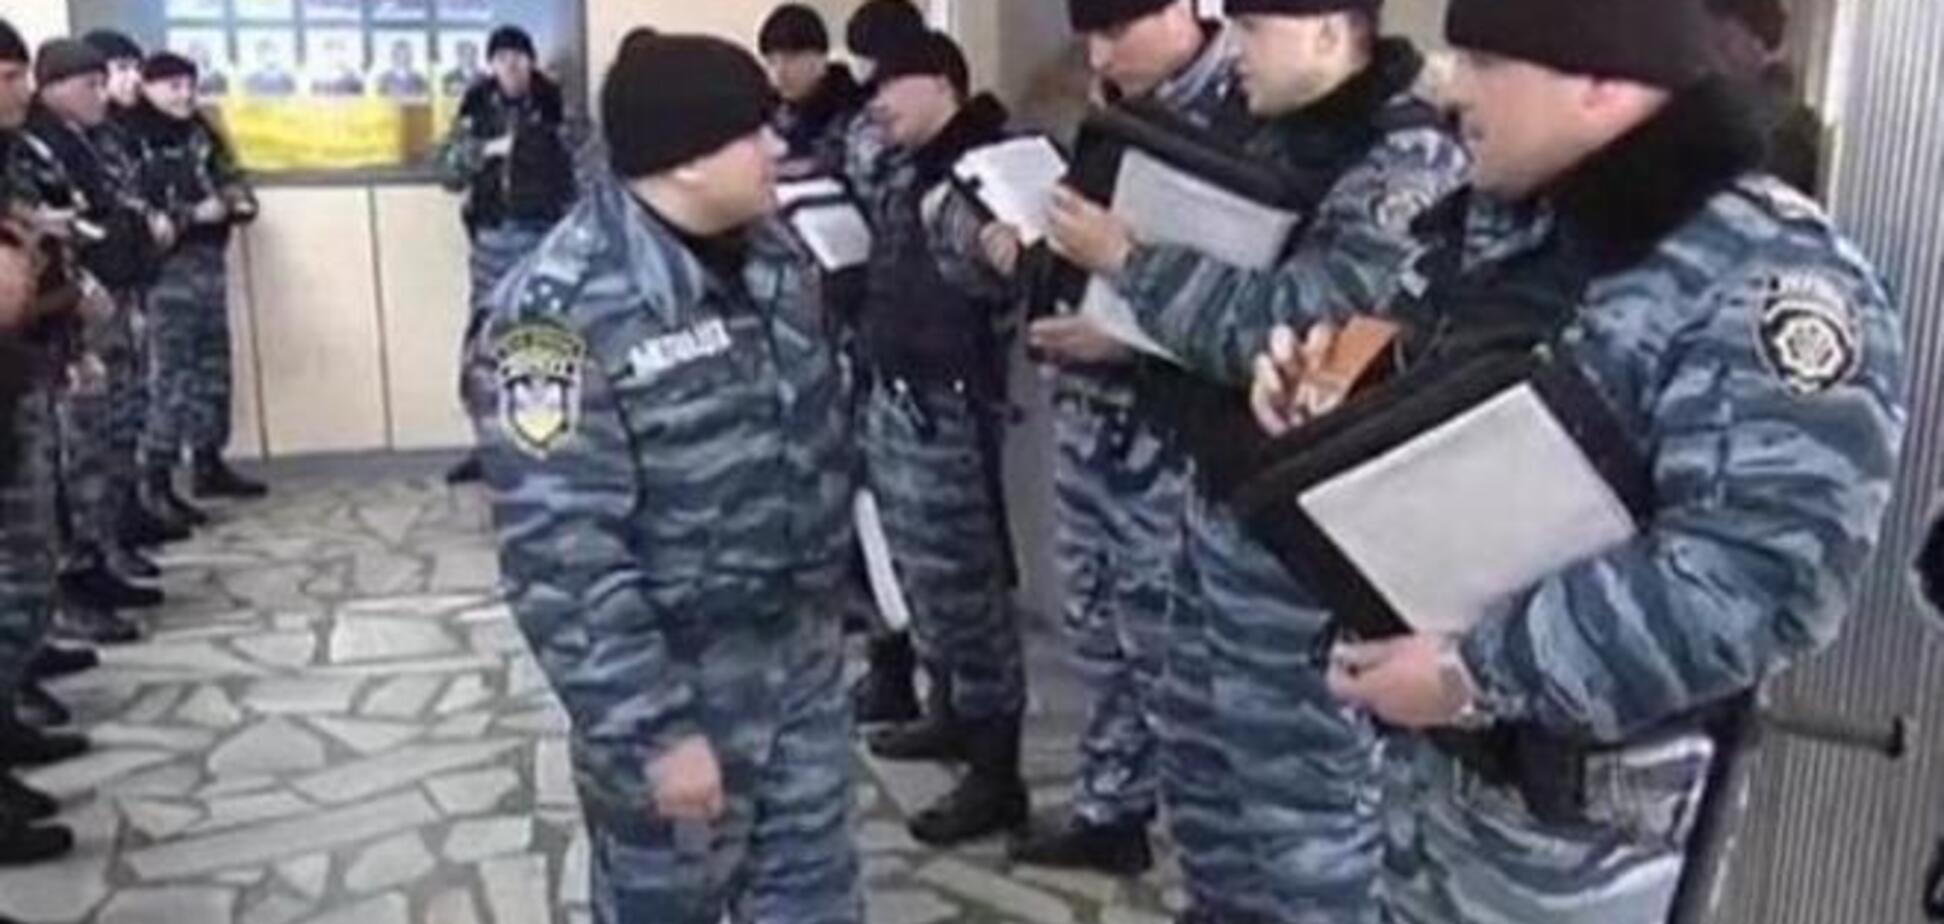 Люди Януковича и Захарченко до сих пор работают в милиции и прокуратуре – СМИ